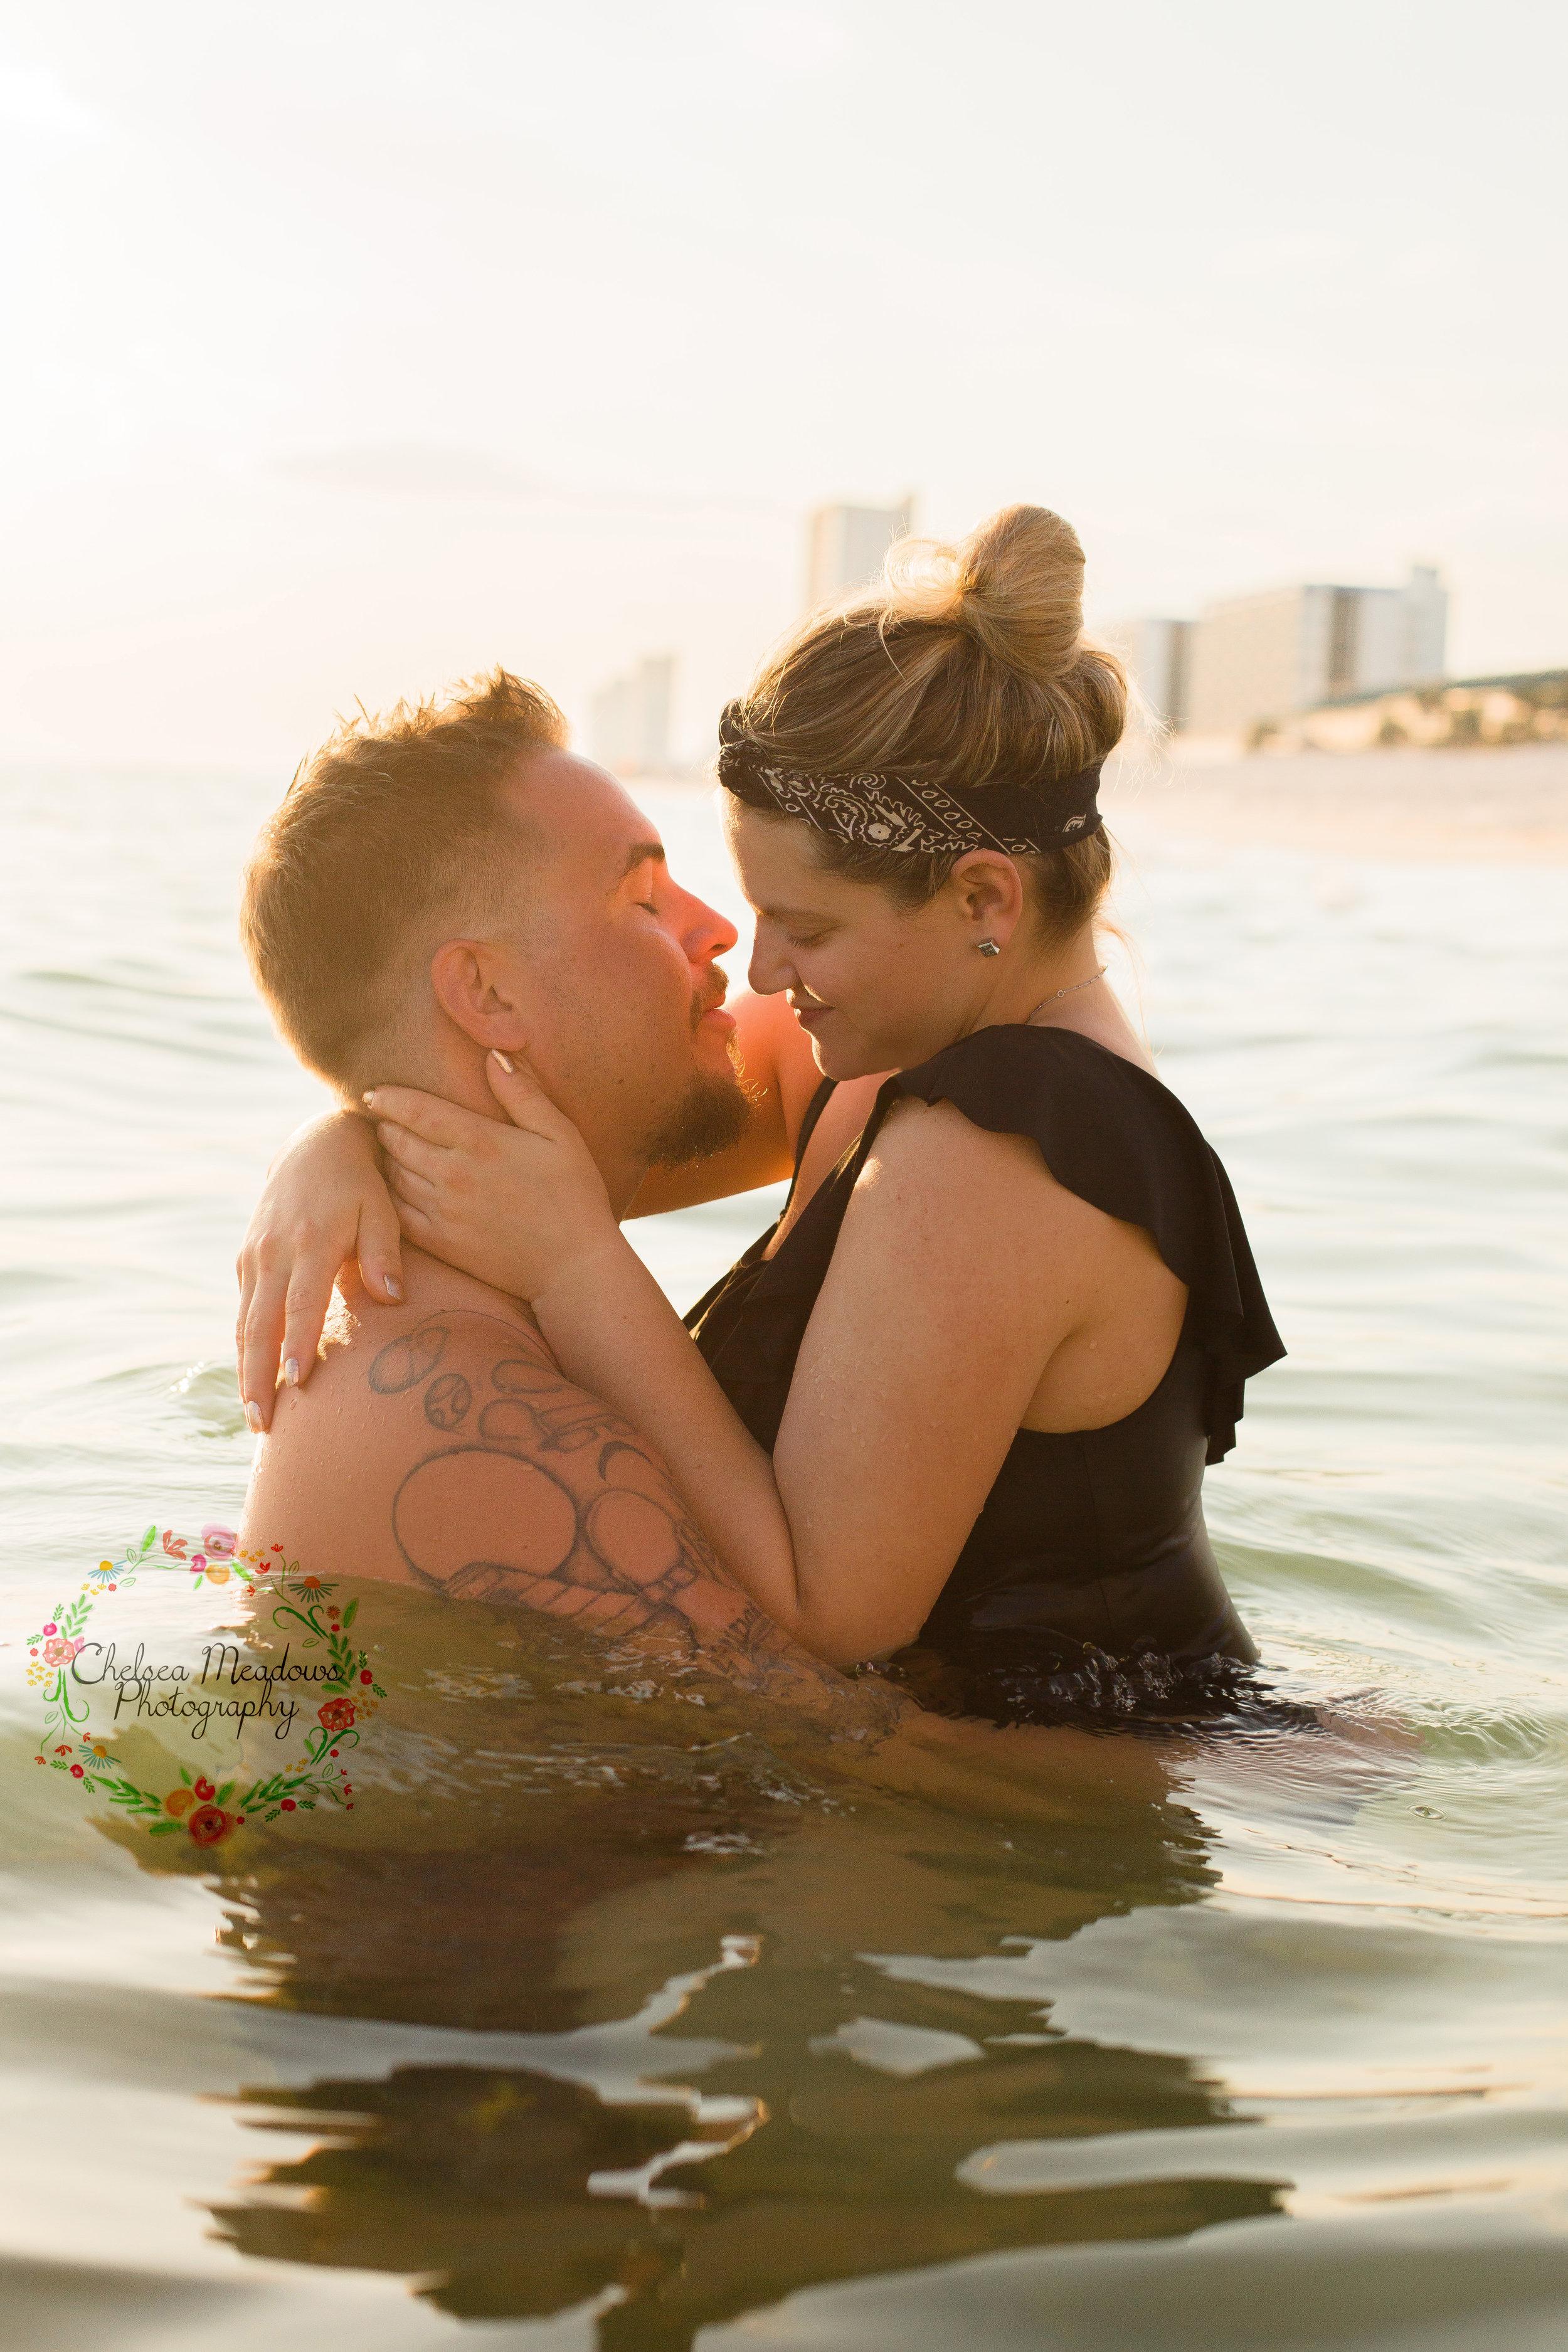 Nicole & Drew Beach Maternity - Nashville Maternity Photography - Chelsea Meadows Photography (3)_edited-1.jpg